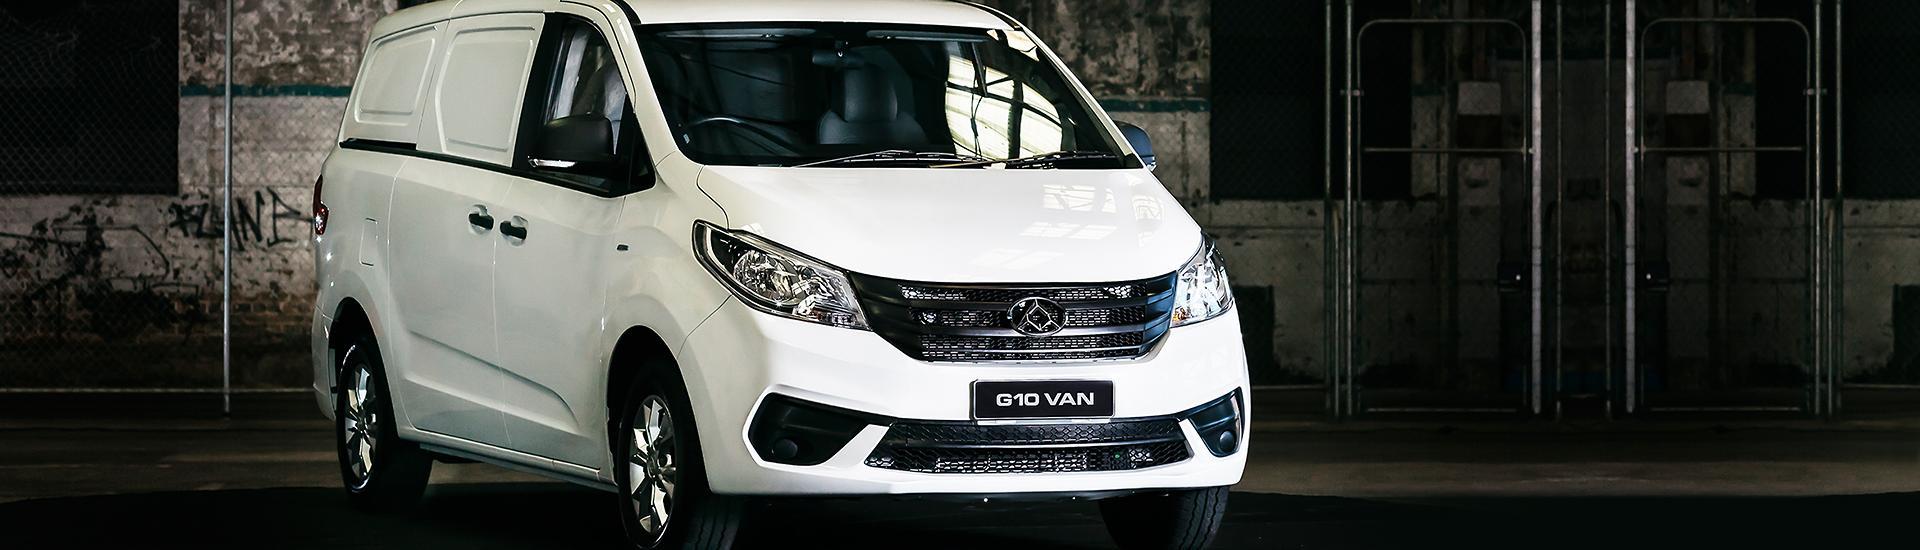 New LDV Cars for Sale in Australia - carsales.com.au